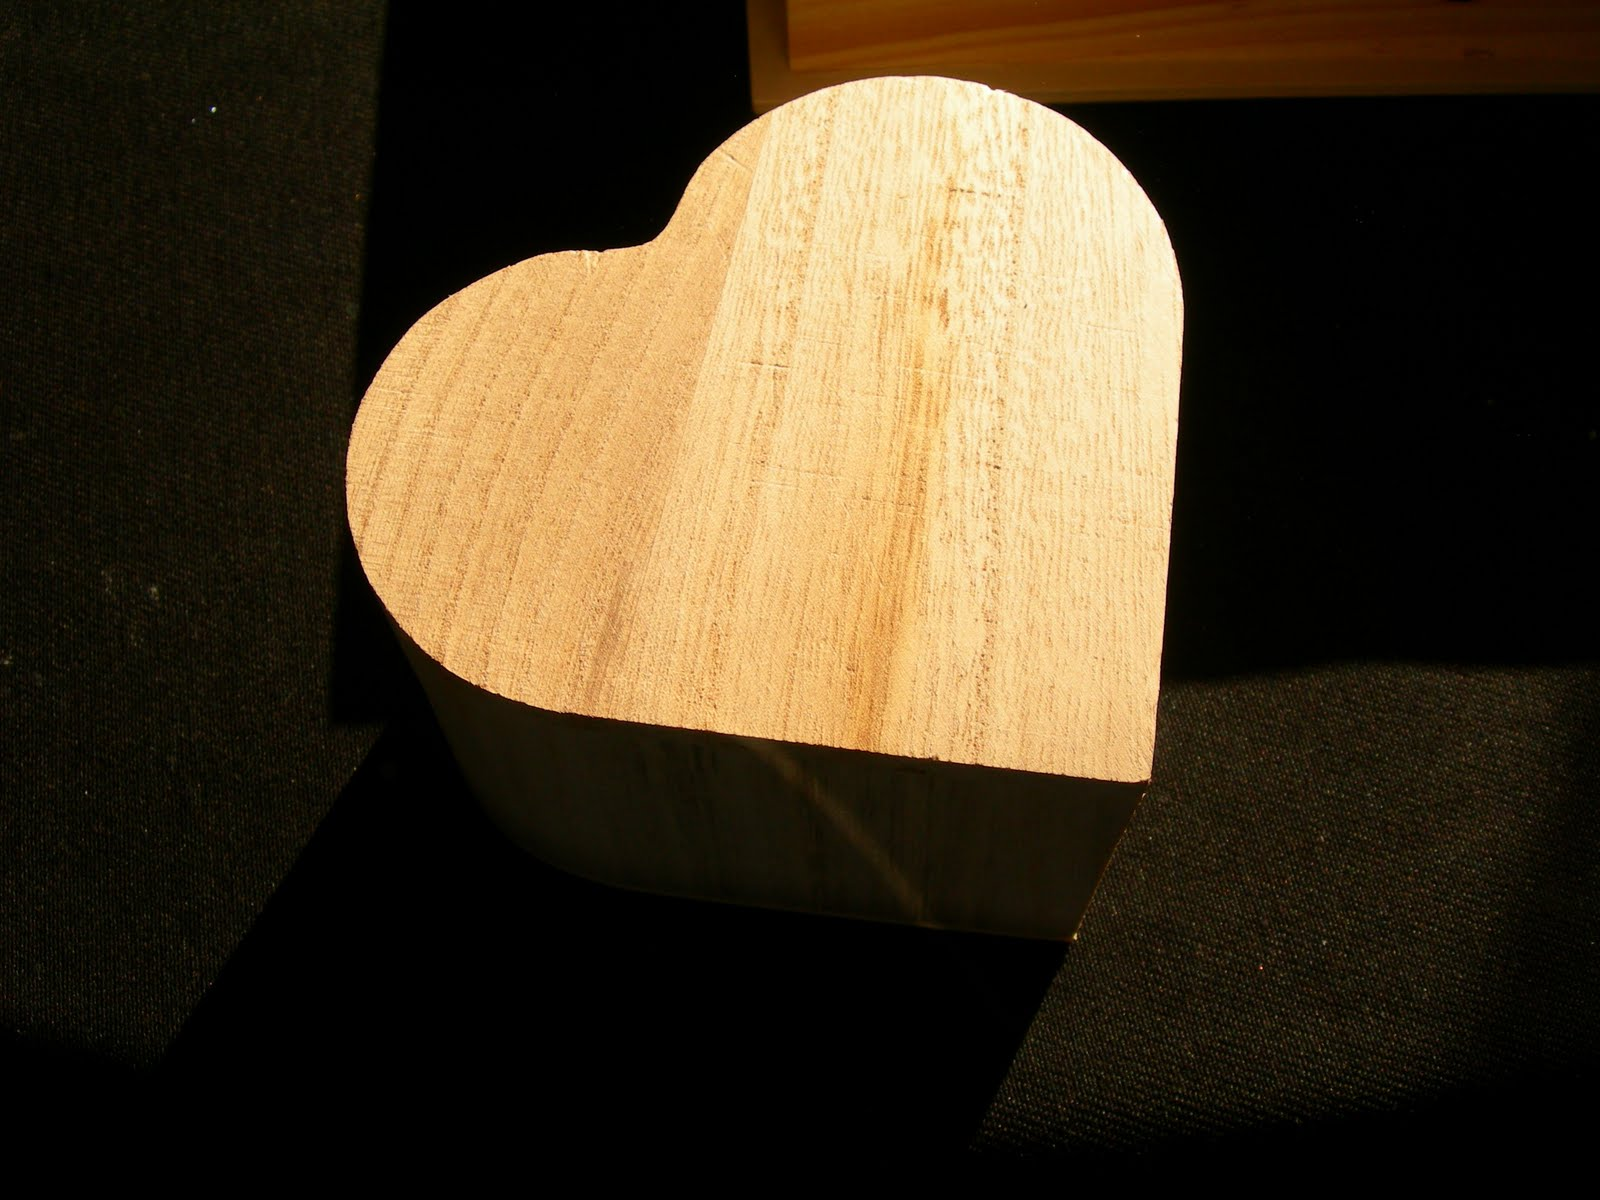 Pin Caixa De Madeira Para Lembrancinha Sapatinho De Luxo Festabox Hd  #673004 1600x1200